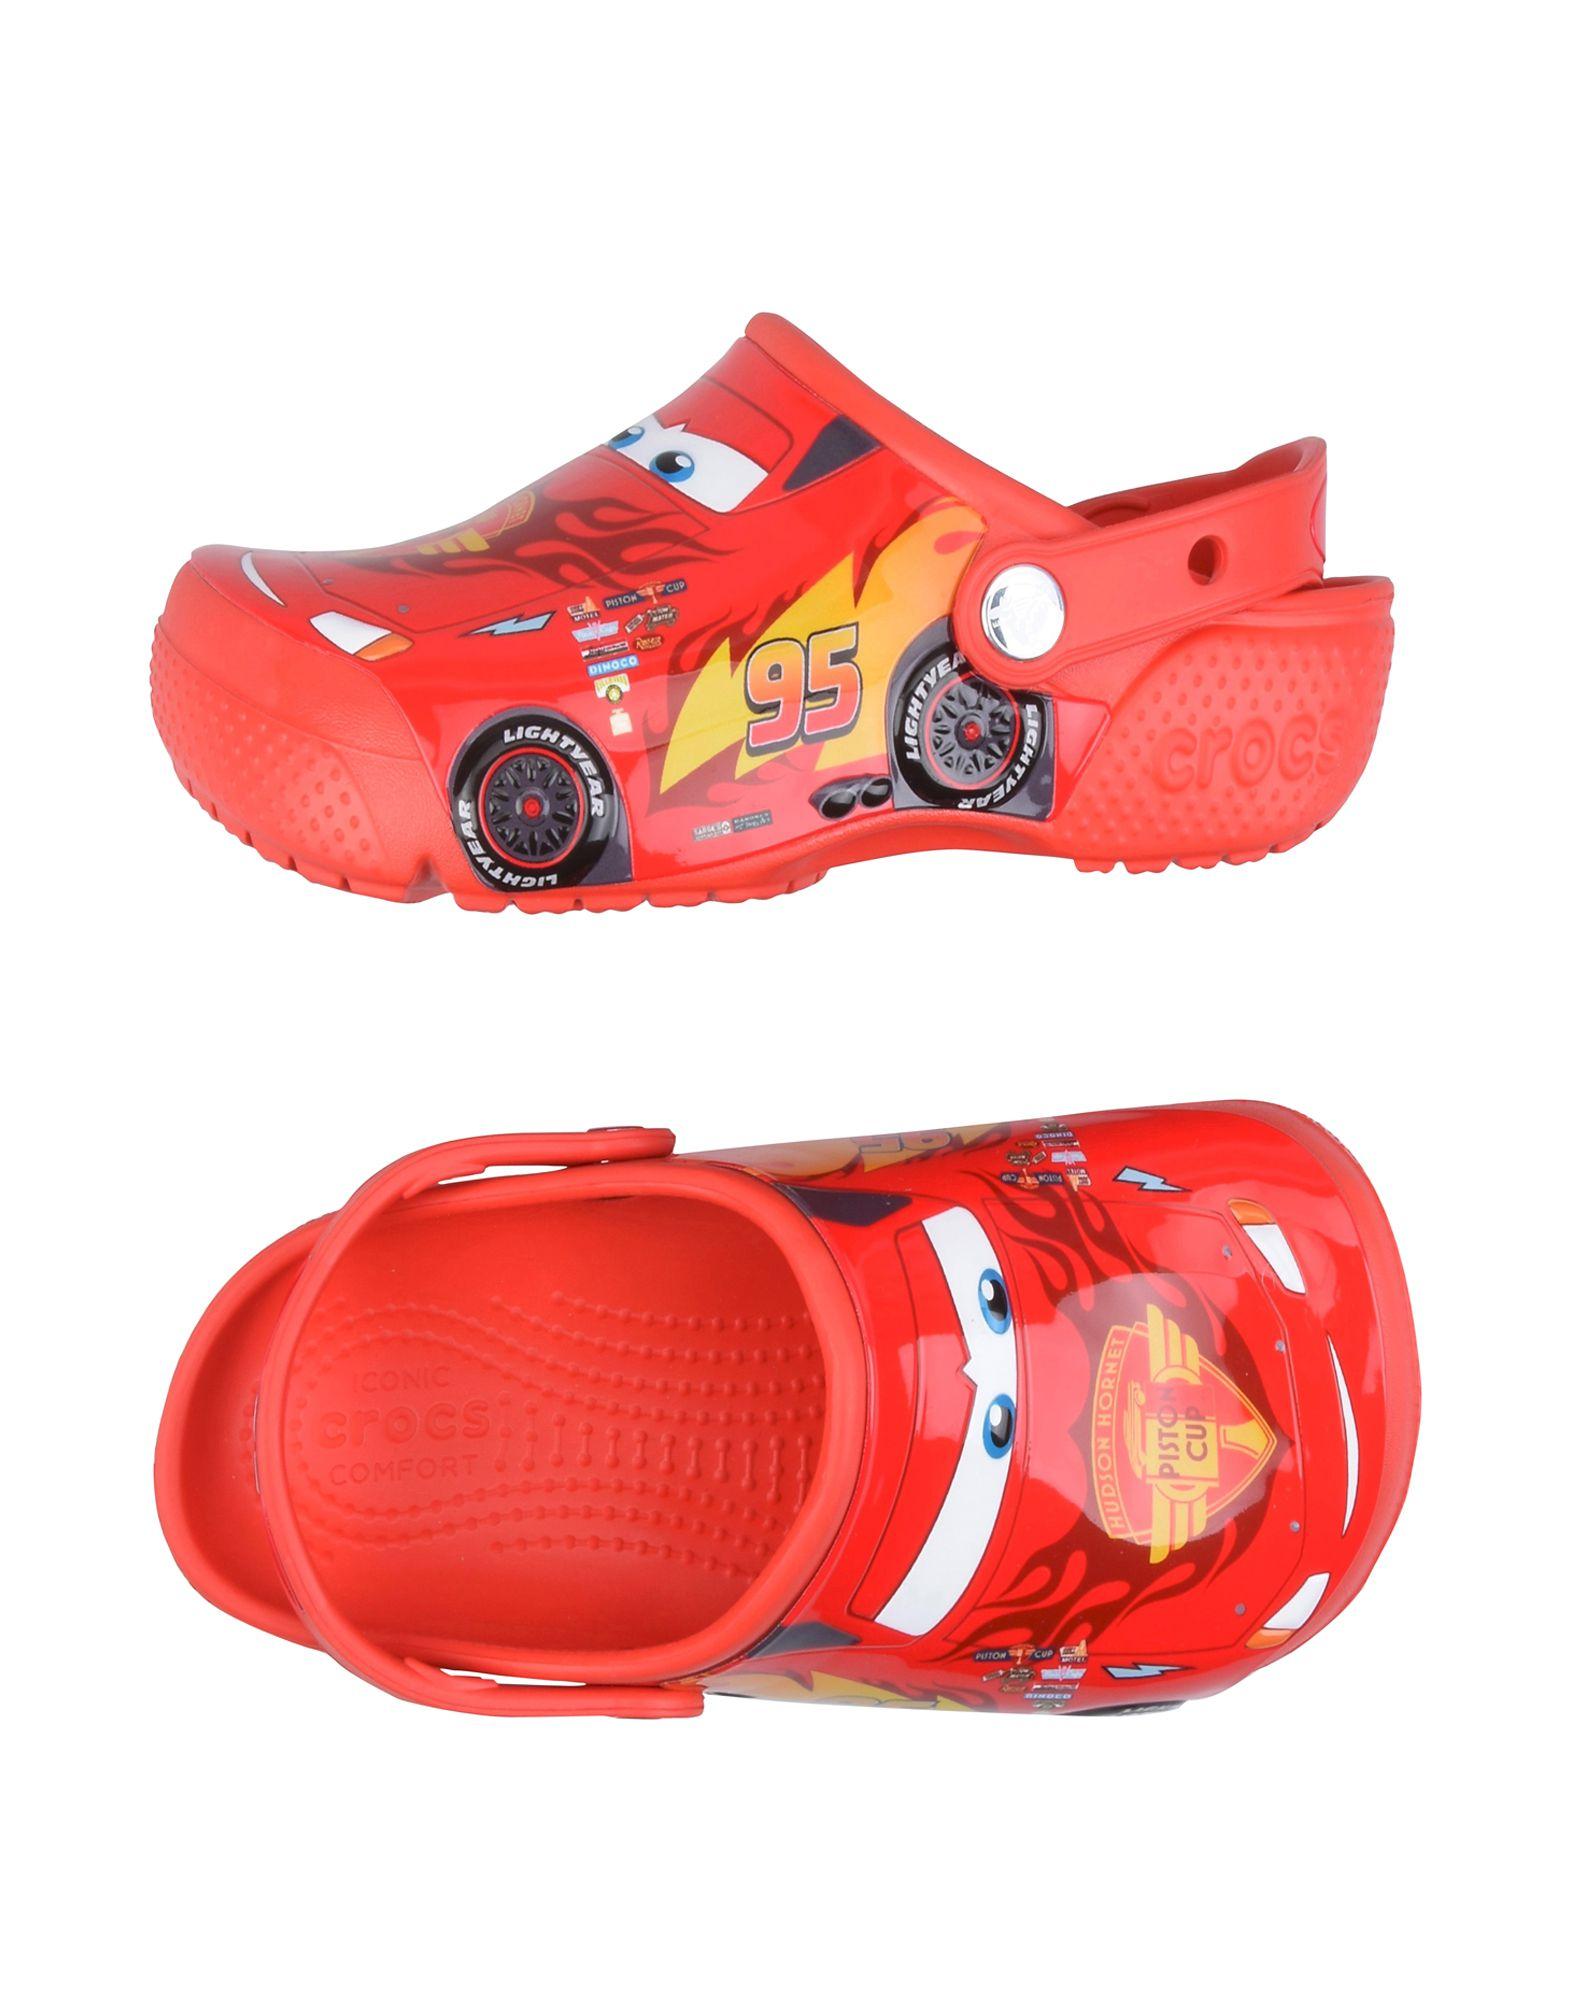 CROCS クロックス ボーイズ サンダル Crocs Fun Lab Cars 3 Clog K レッド